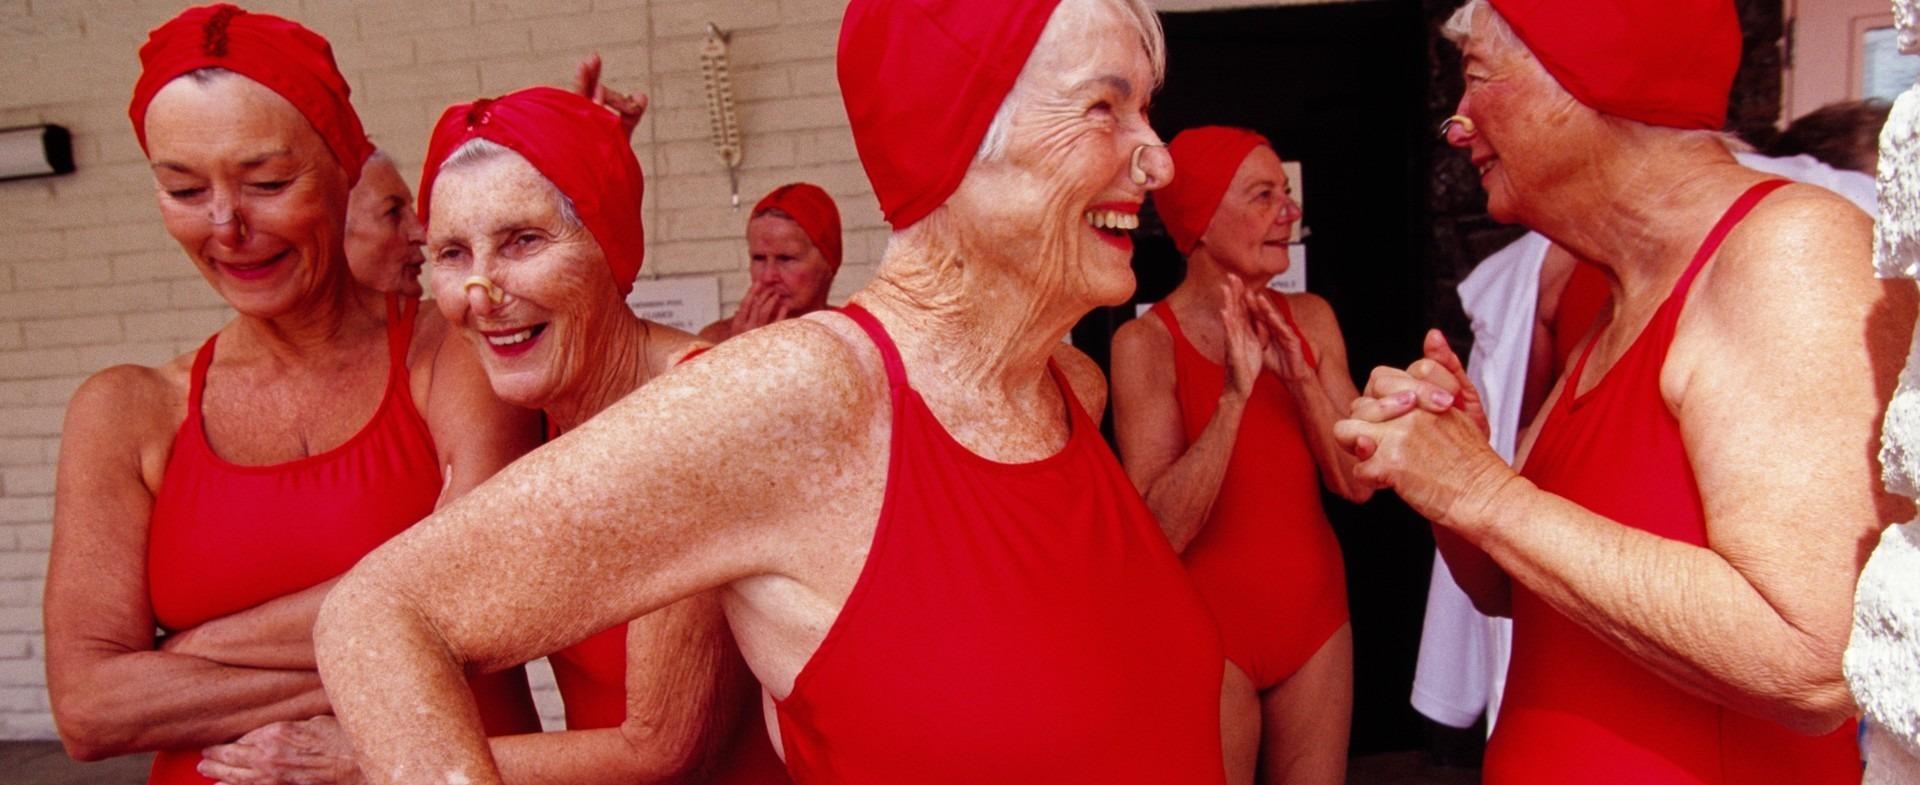 Senior citizen females in their swimwear